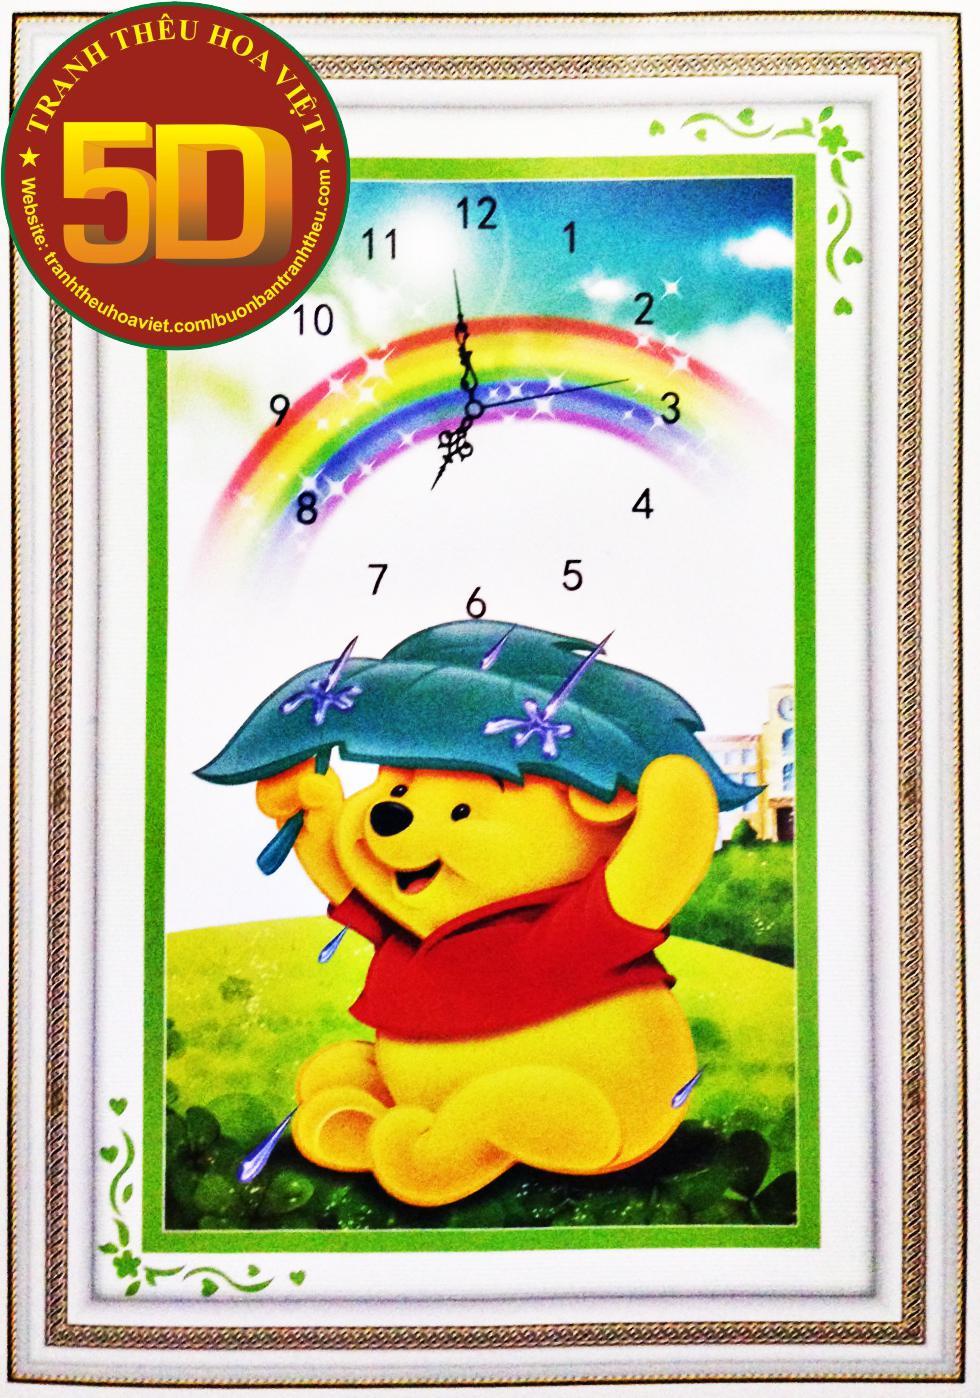 Đồng hồ gấu pooh